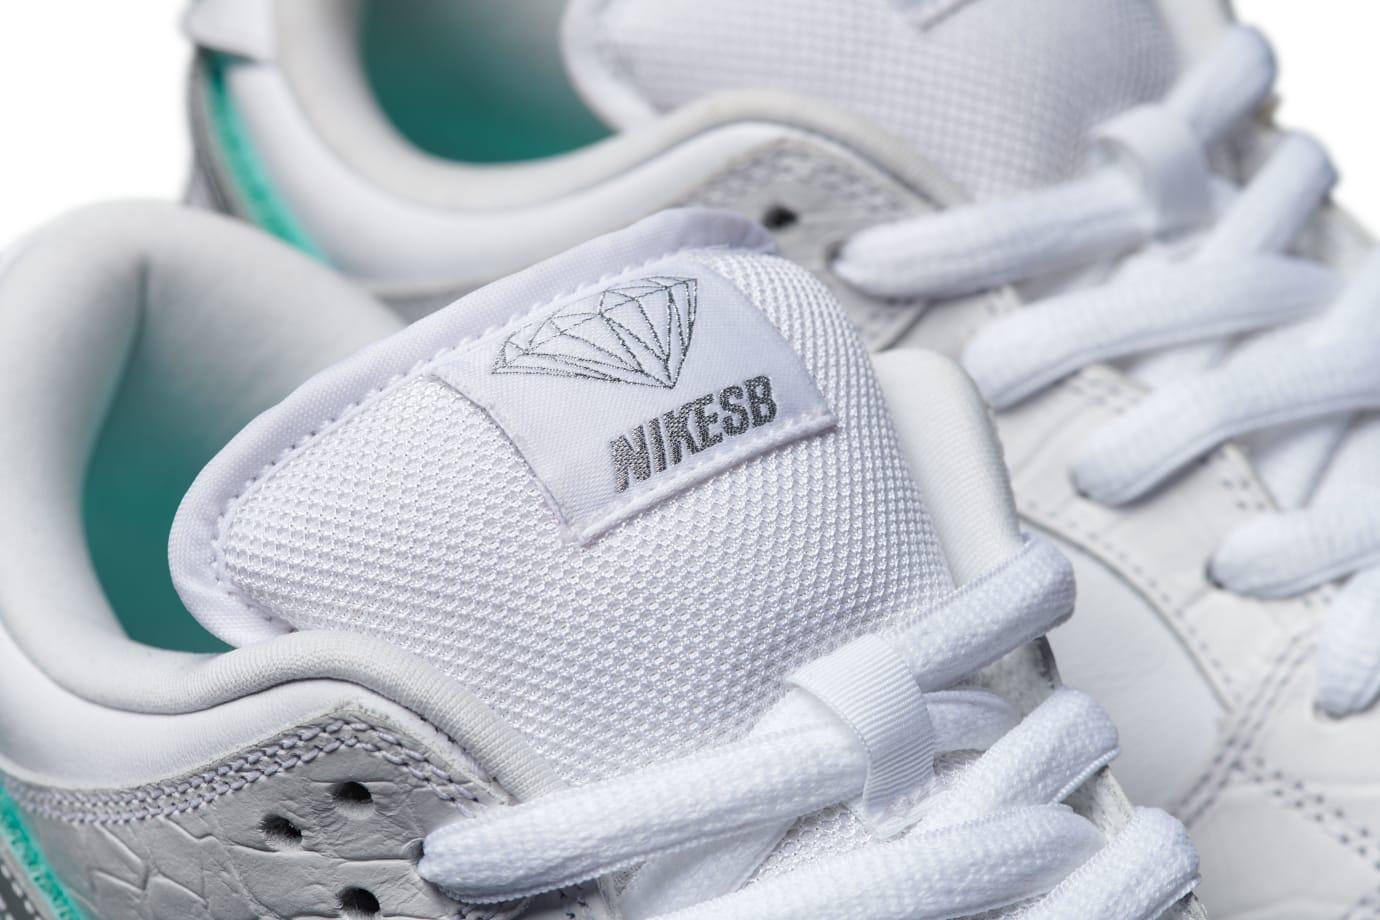 Diamond Supply Co. x Nike SB Dunk Low 'White' (Tongue)